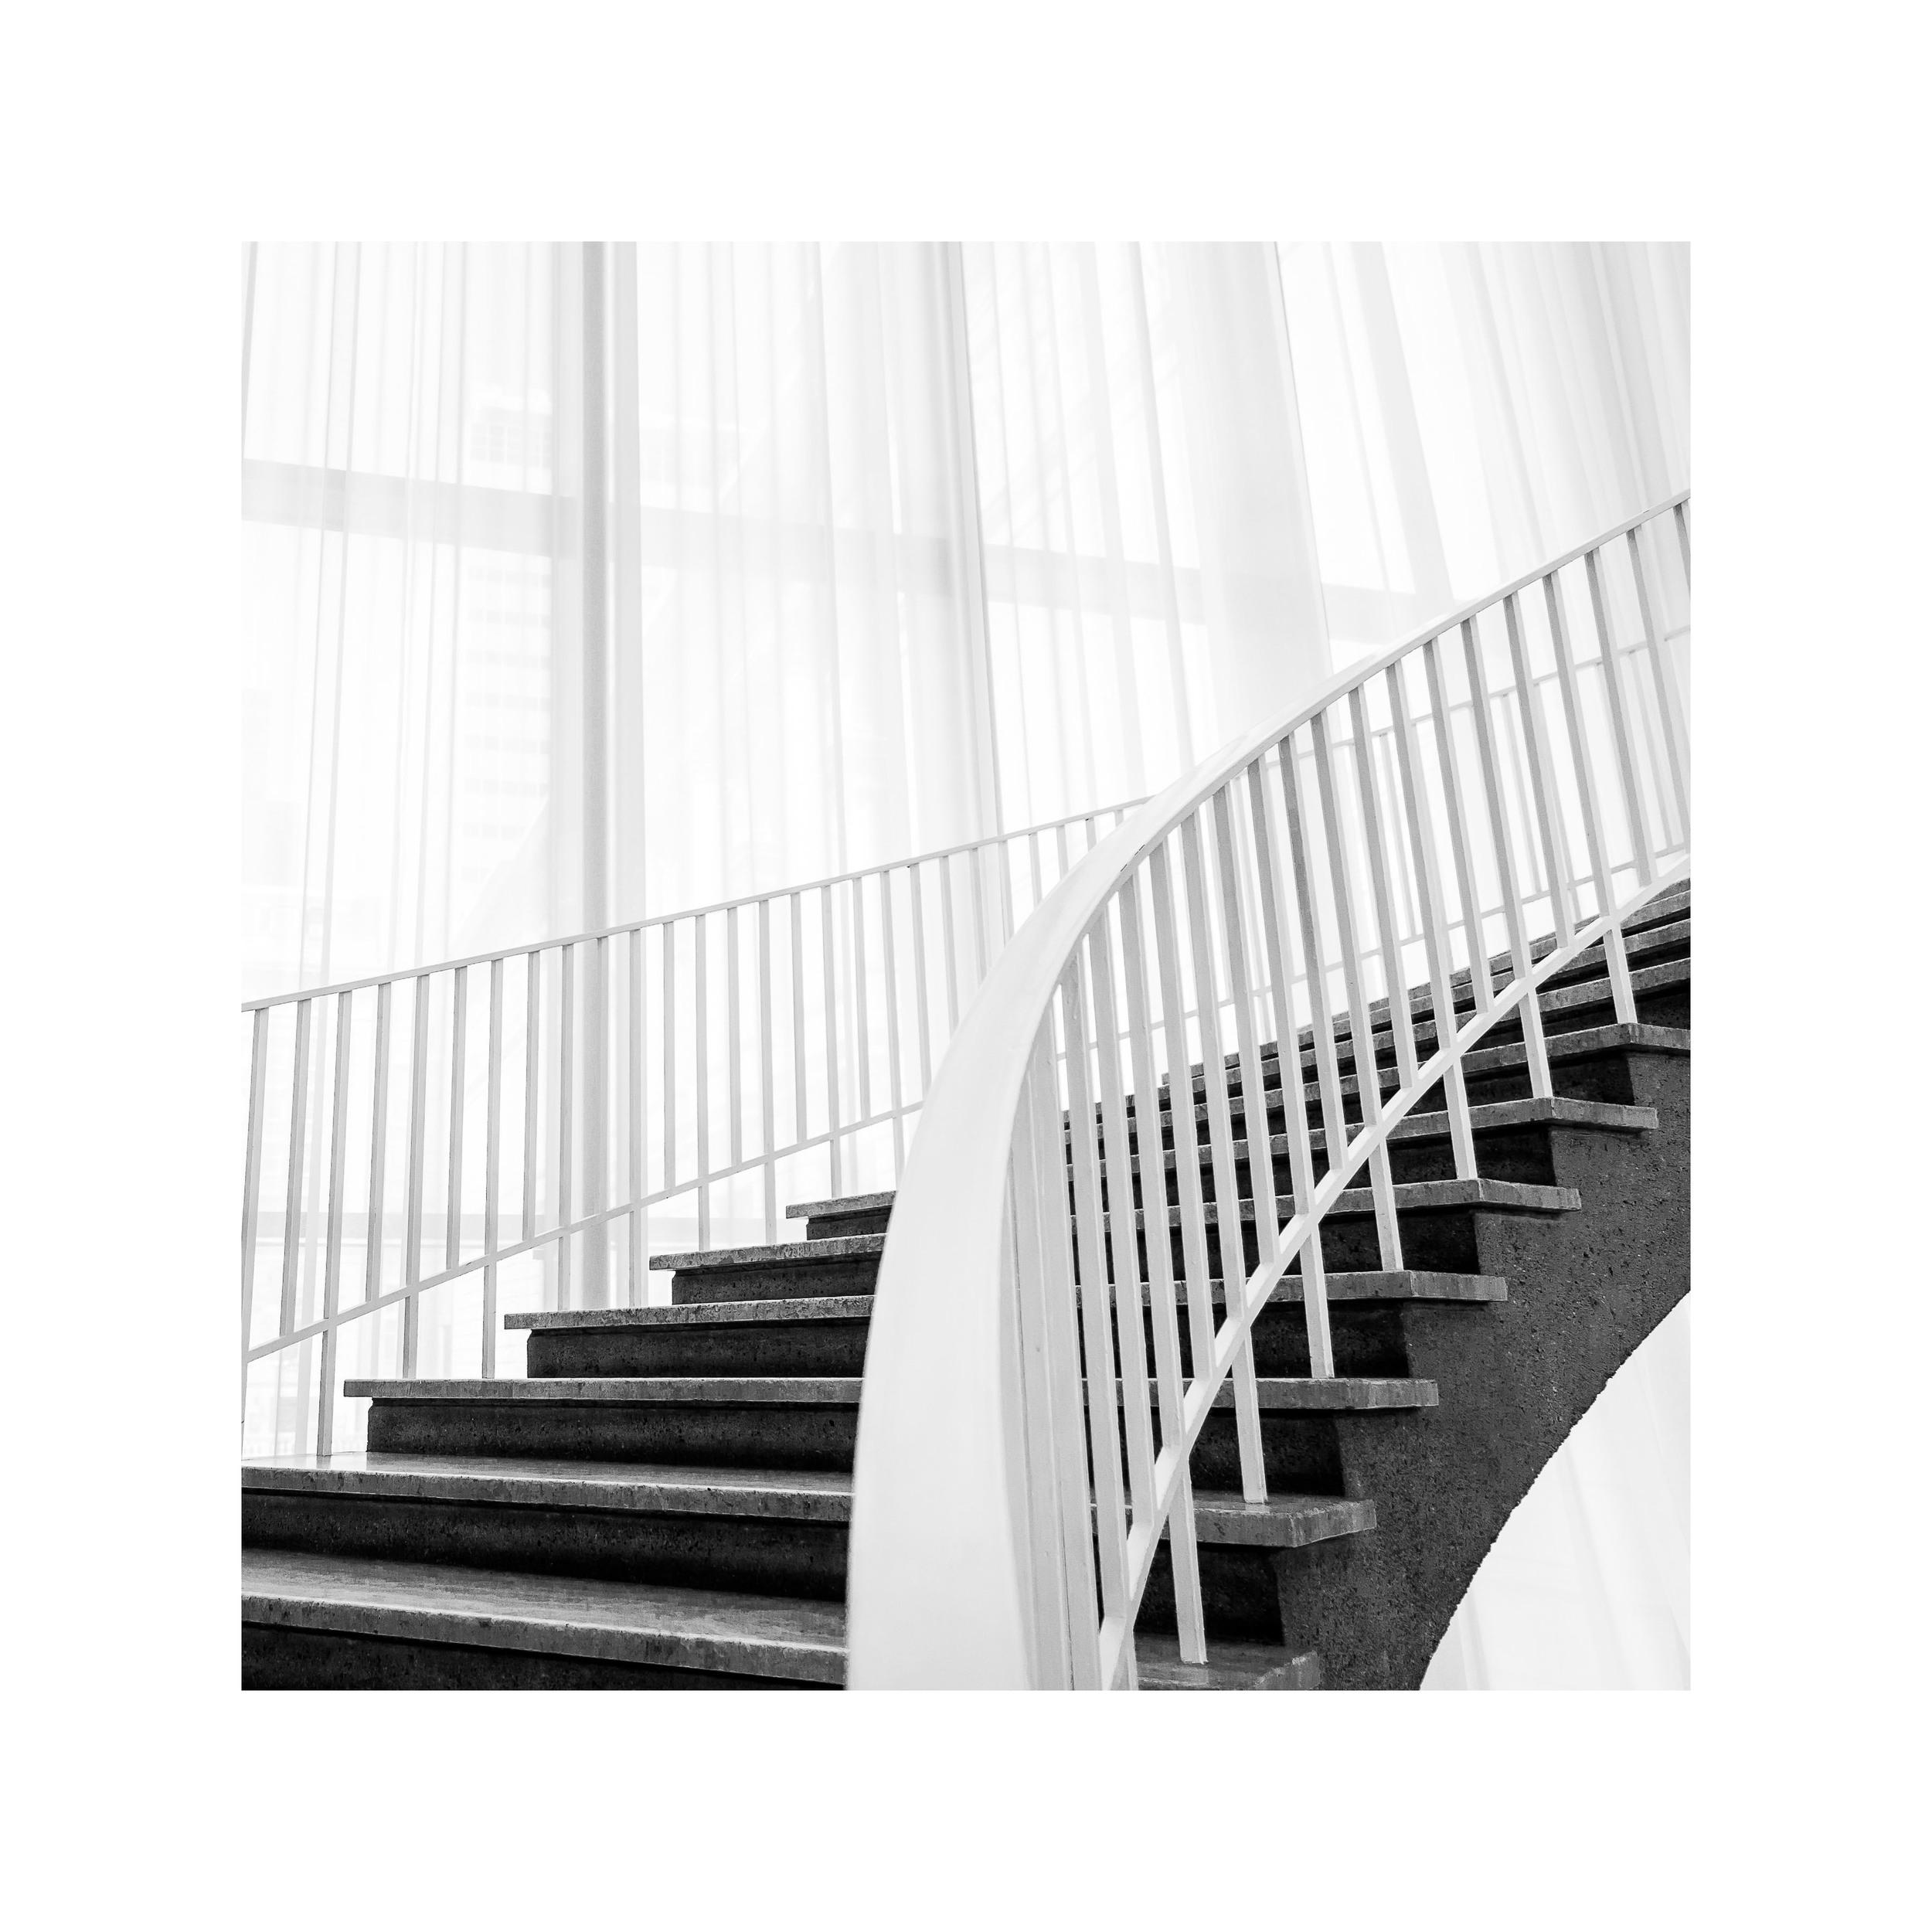 Art Institute Staircase Study. 12x12 framed. $75.